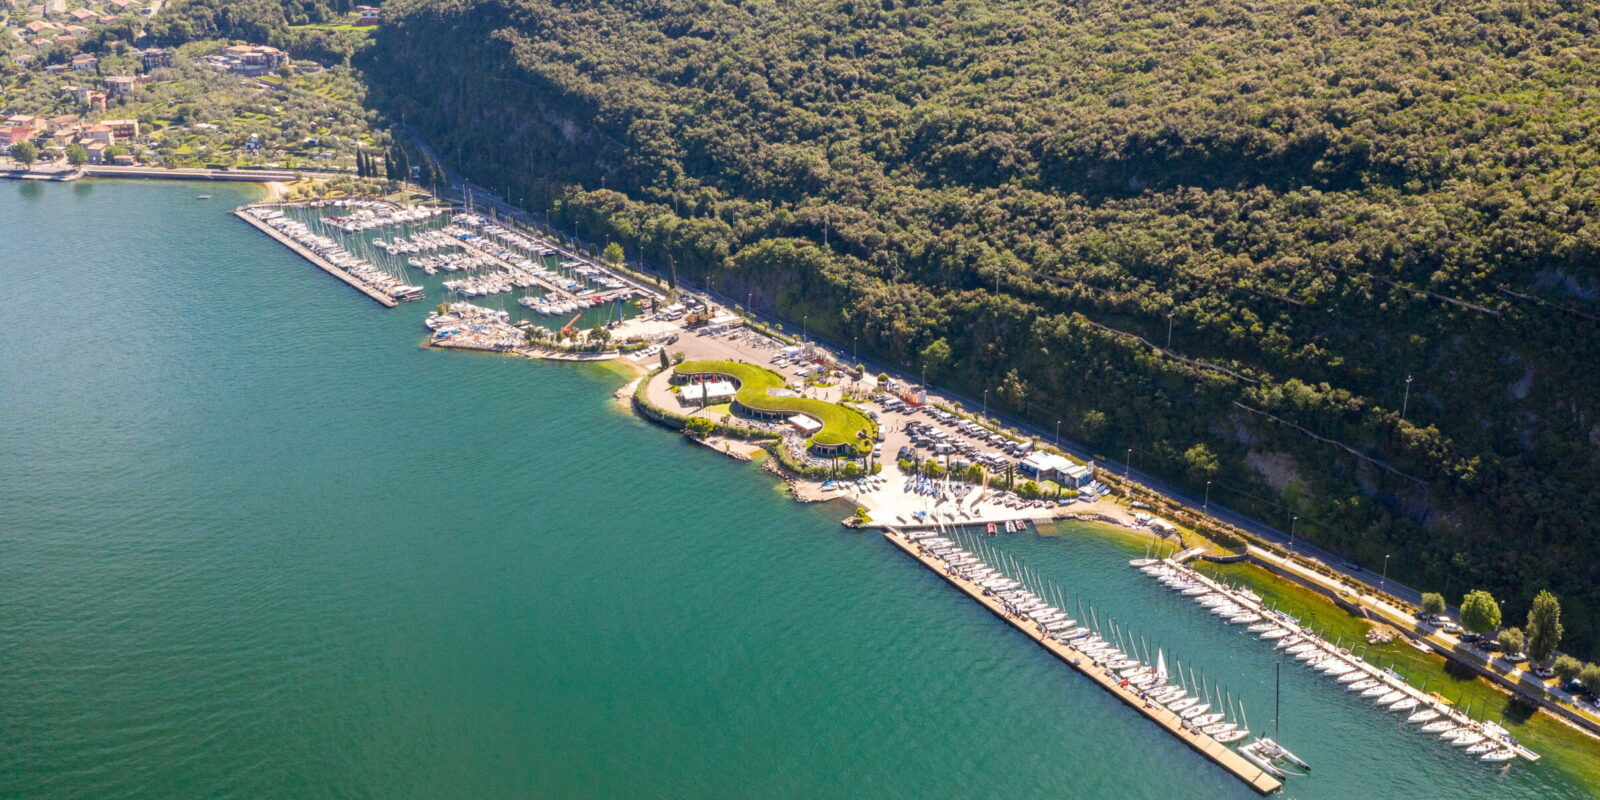 Vista aerea Sede Fraglia Vela Malcesine, Navene, Lago di Garda